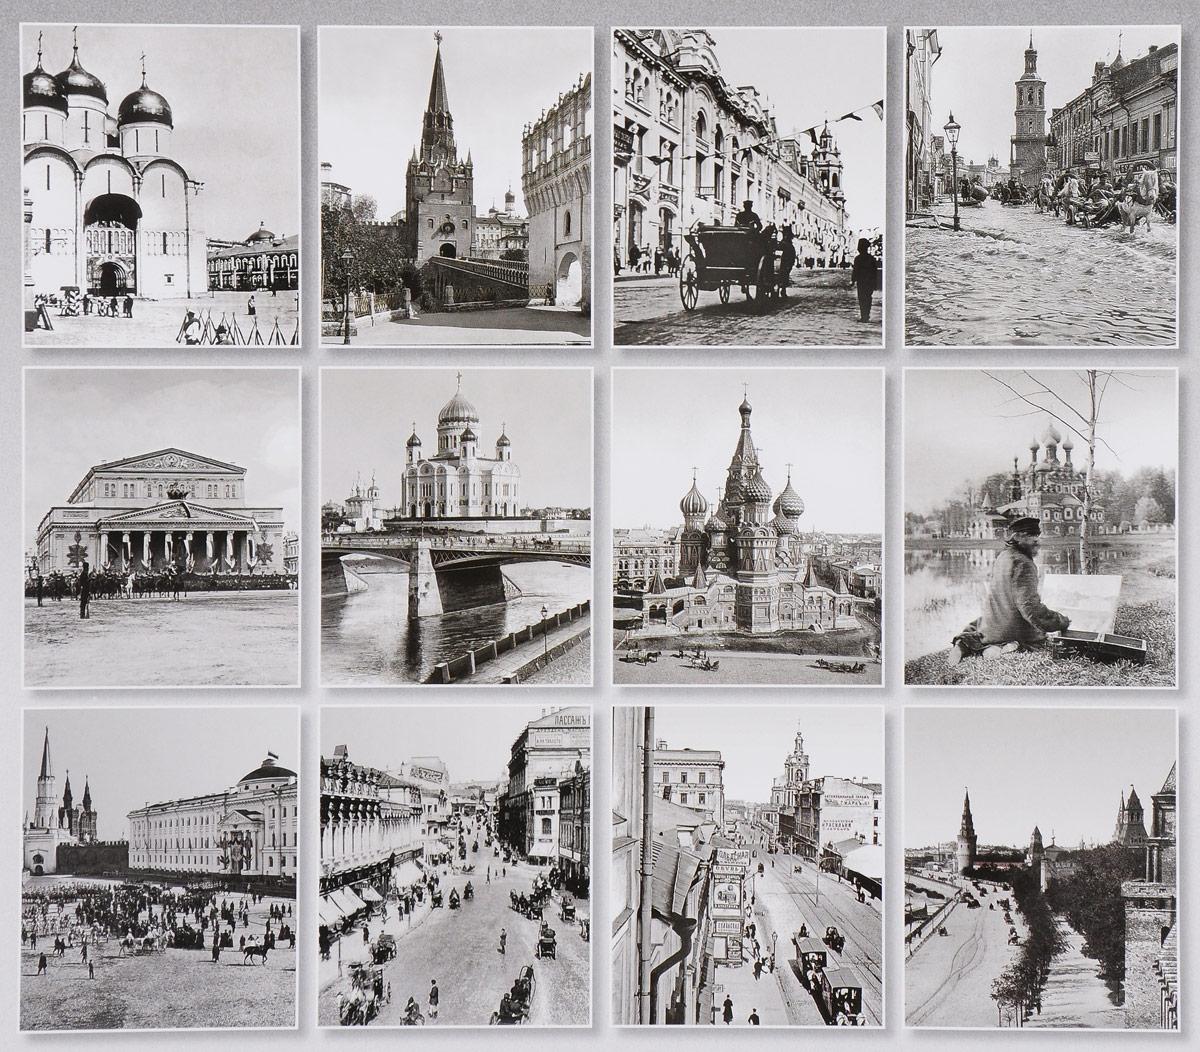 Календарь 2017 (на спирали). Старая Москва / Old Moscow